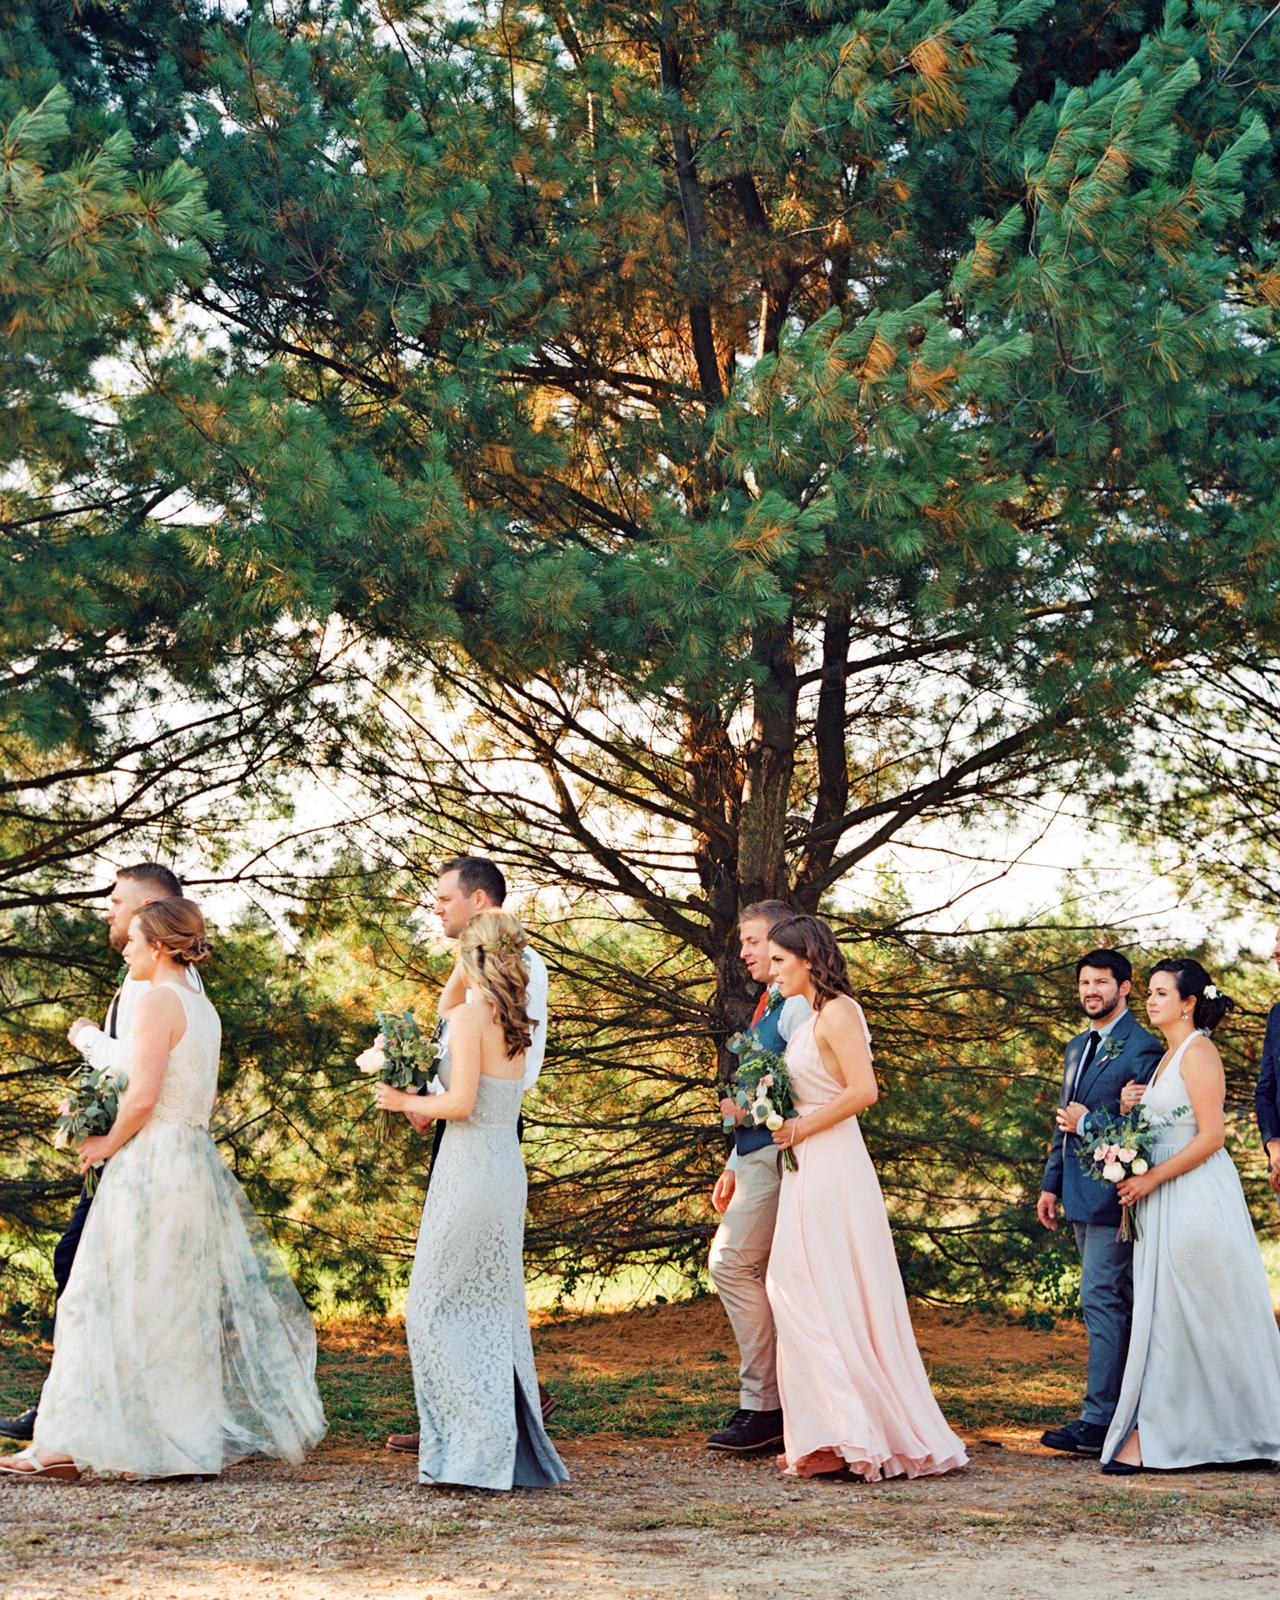 rachel elijah wedding processional wedding party